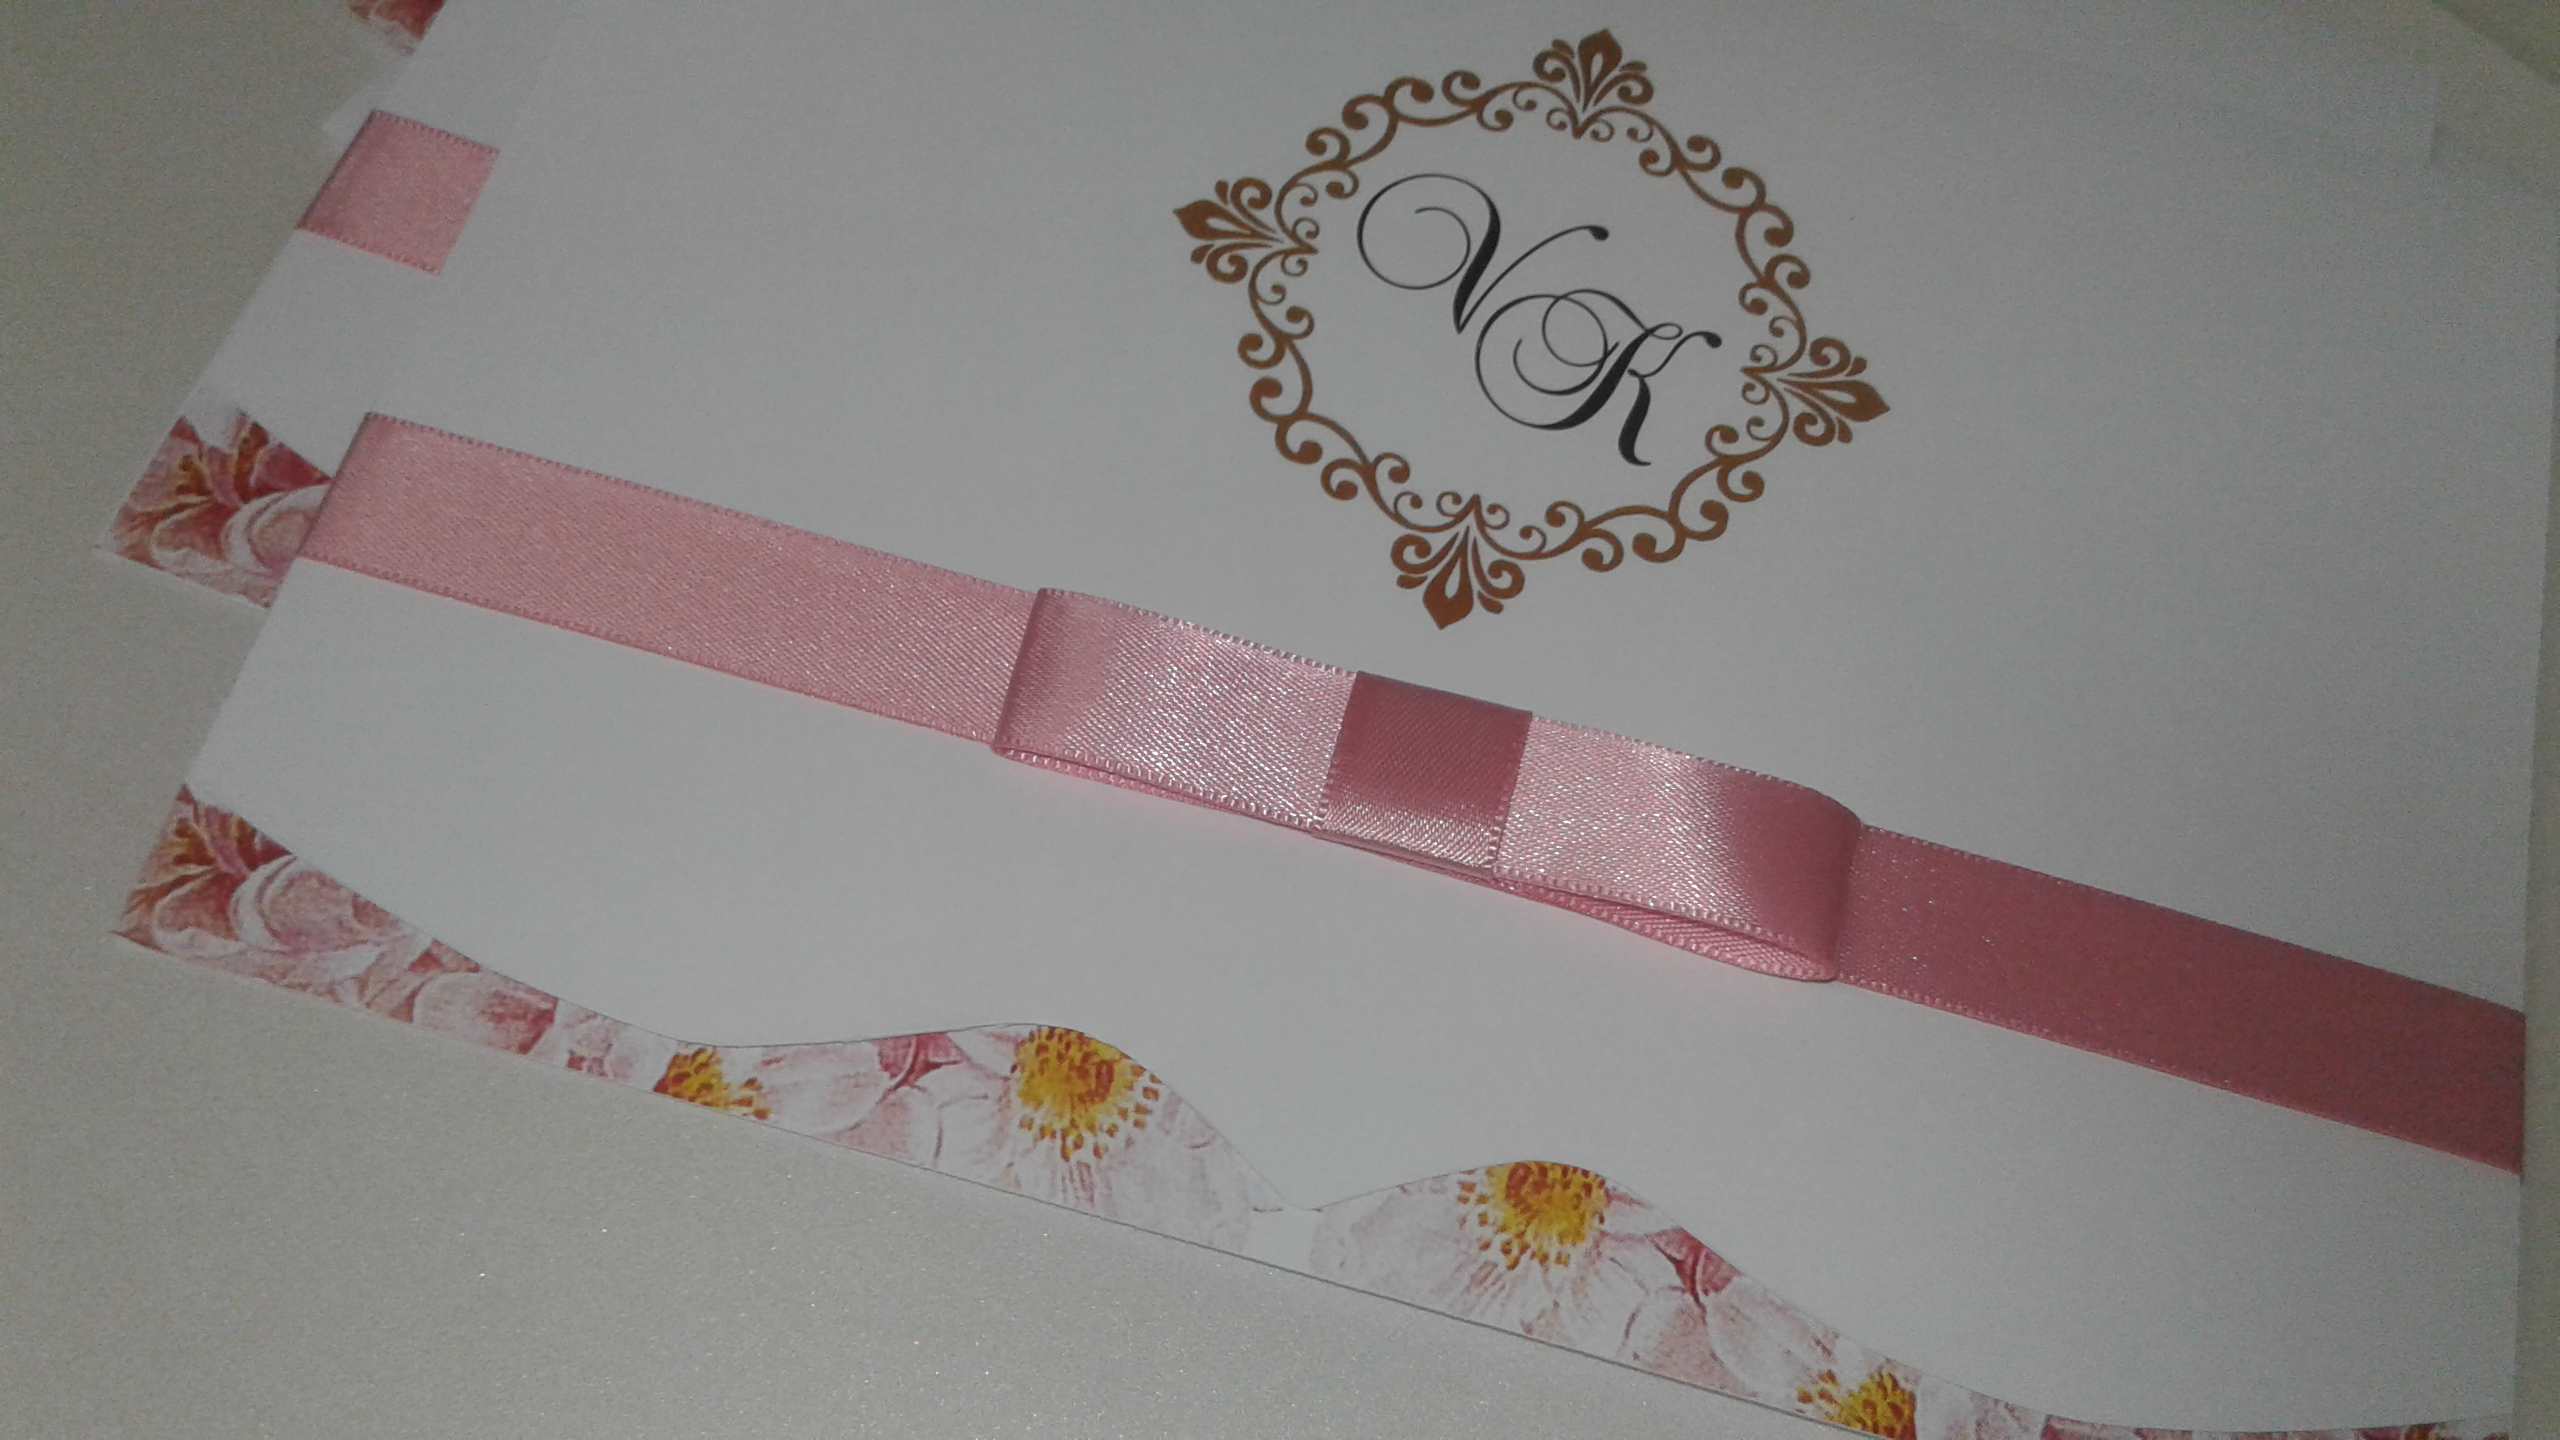 Convite barra floral com recorte especial